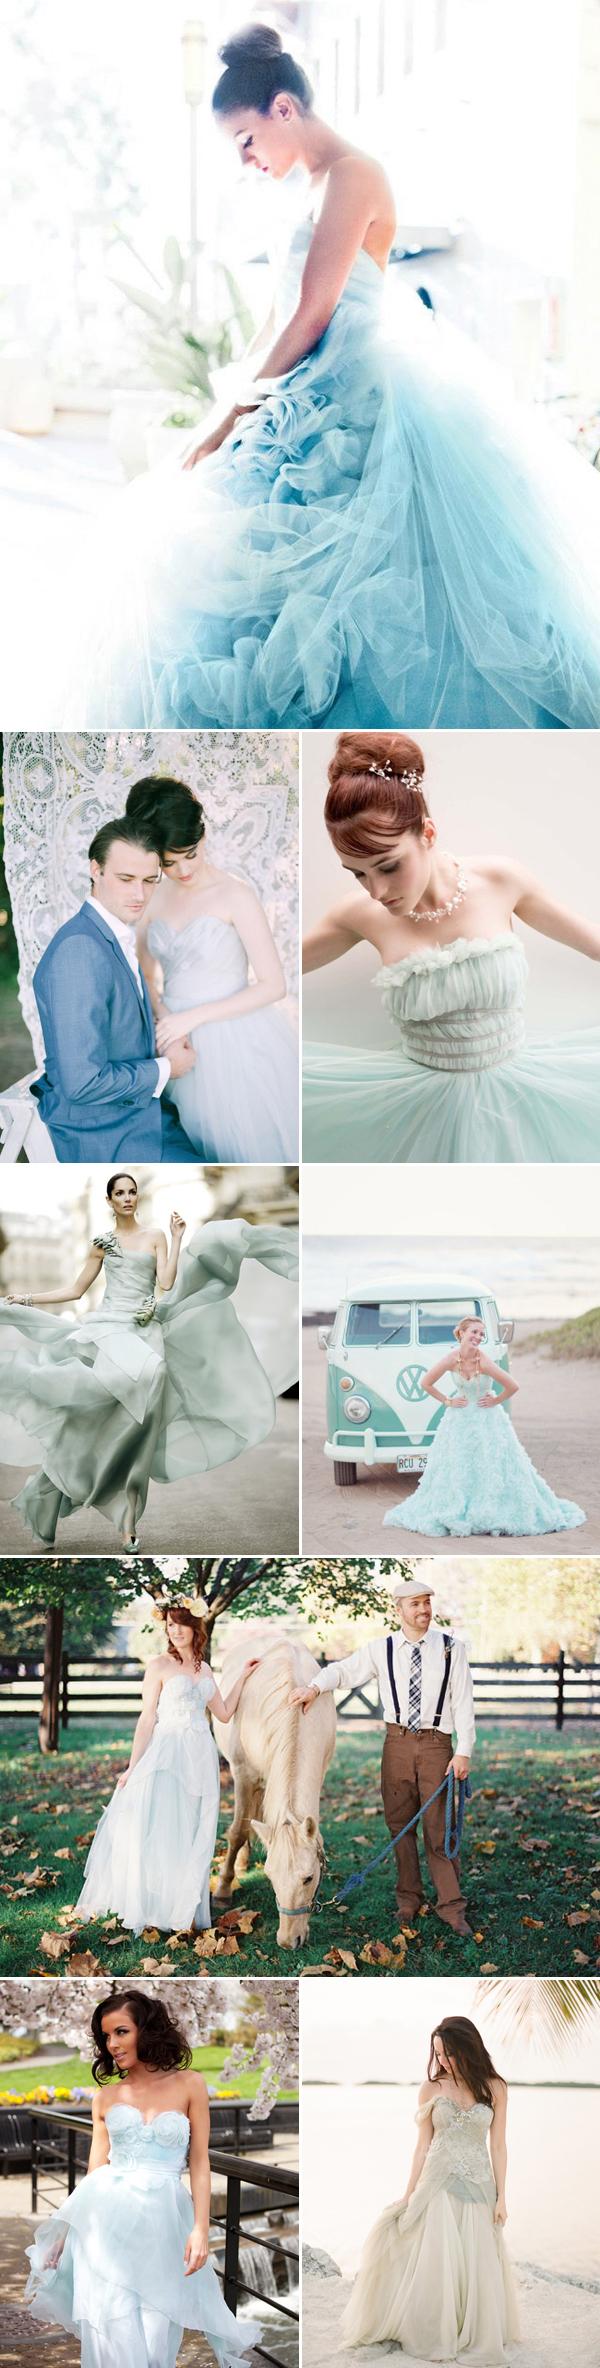 Color wedding dresses01-blue